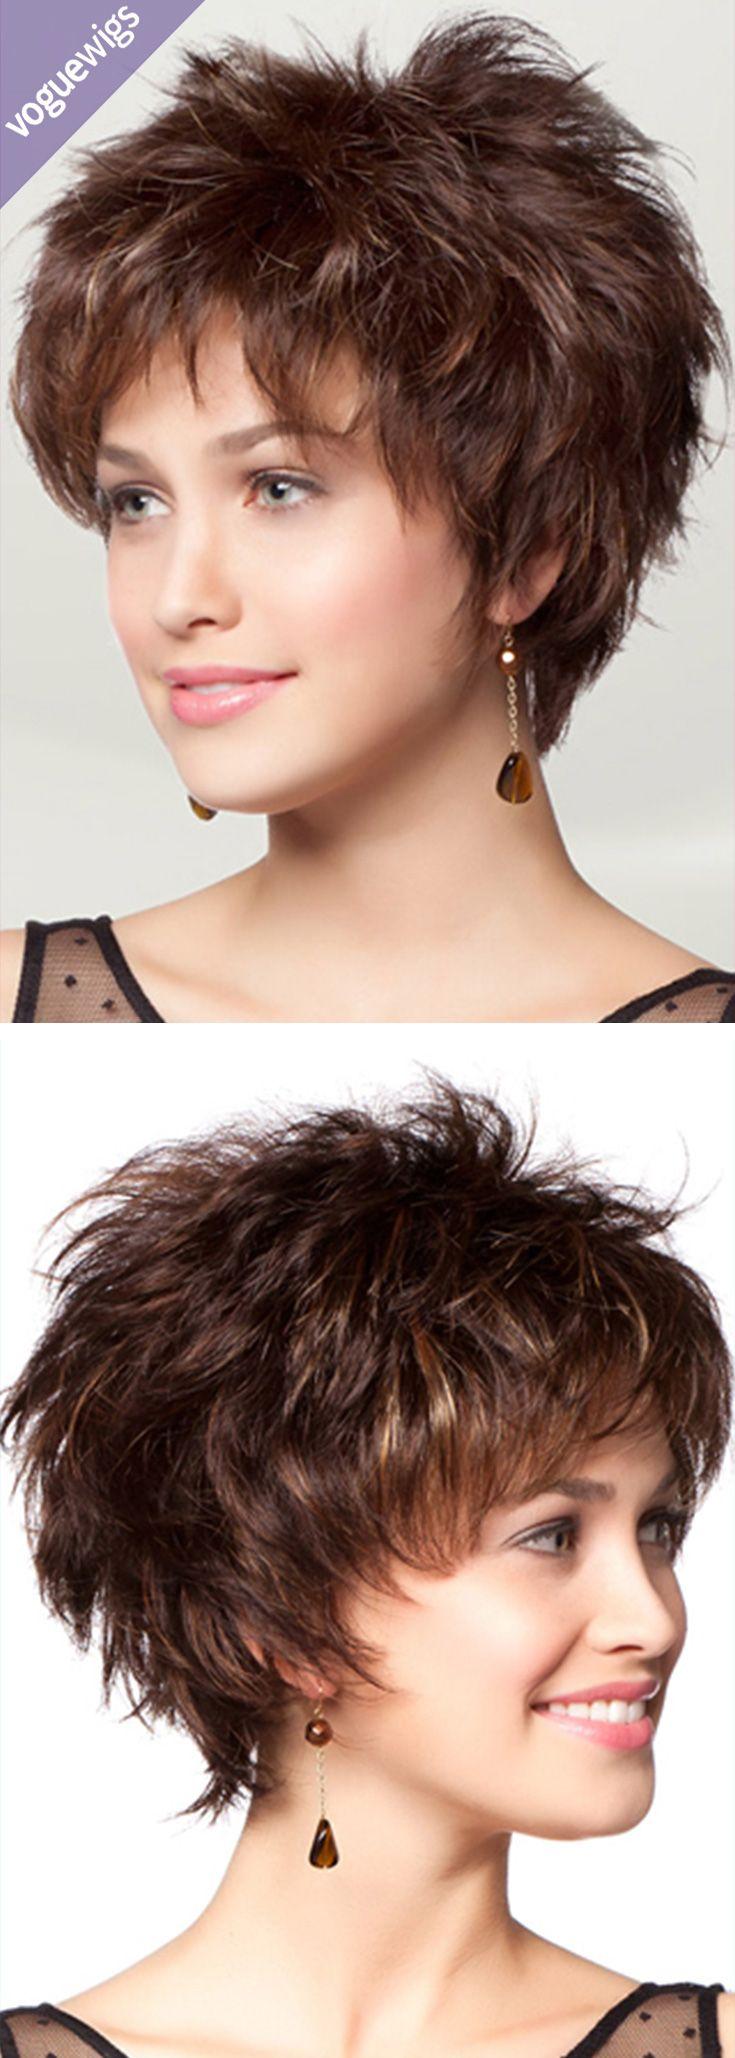 TressAllure Brianna Synthetic Wig, SILVER SHADOW A 50/50